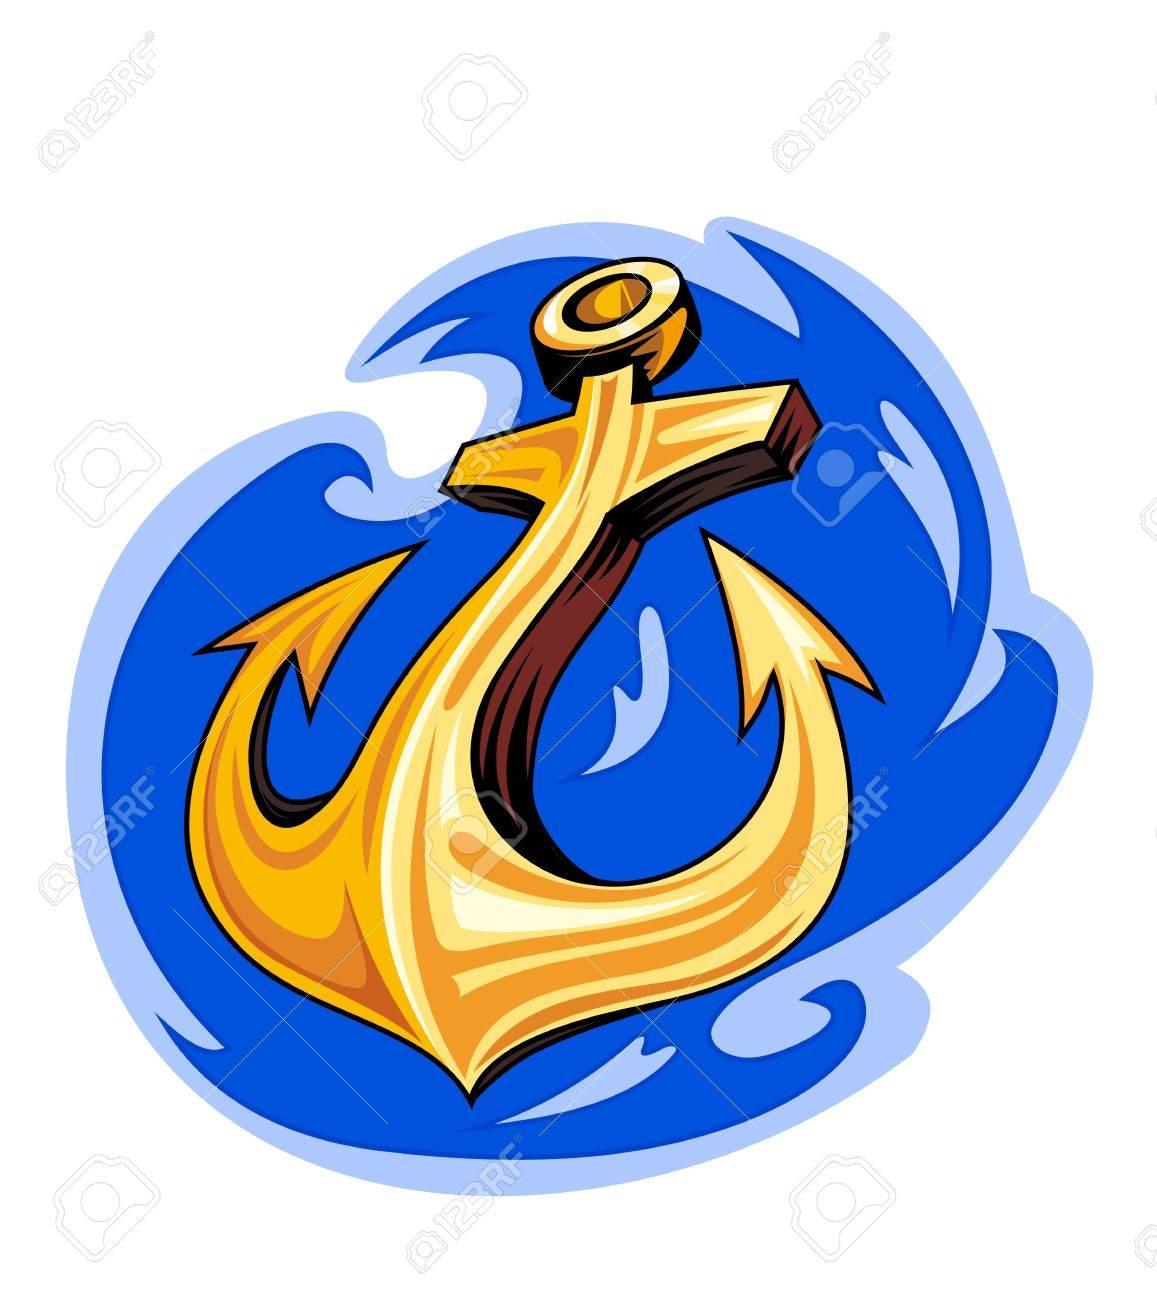 Sailor tattoo - ancient anchor in ocean water Stock Vector - 12306838